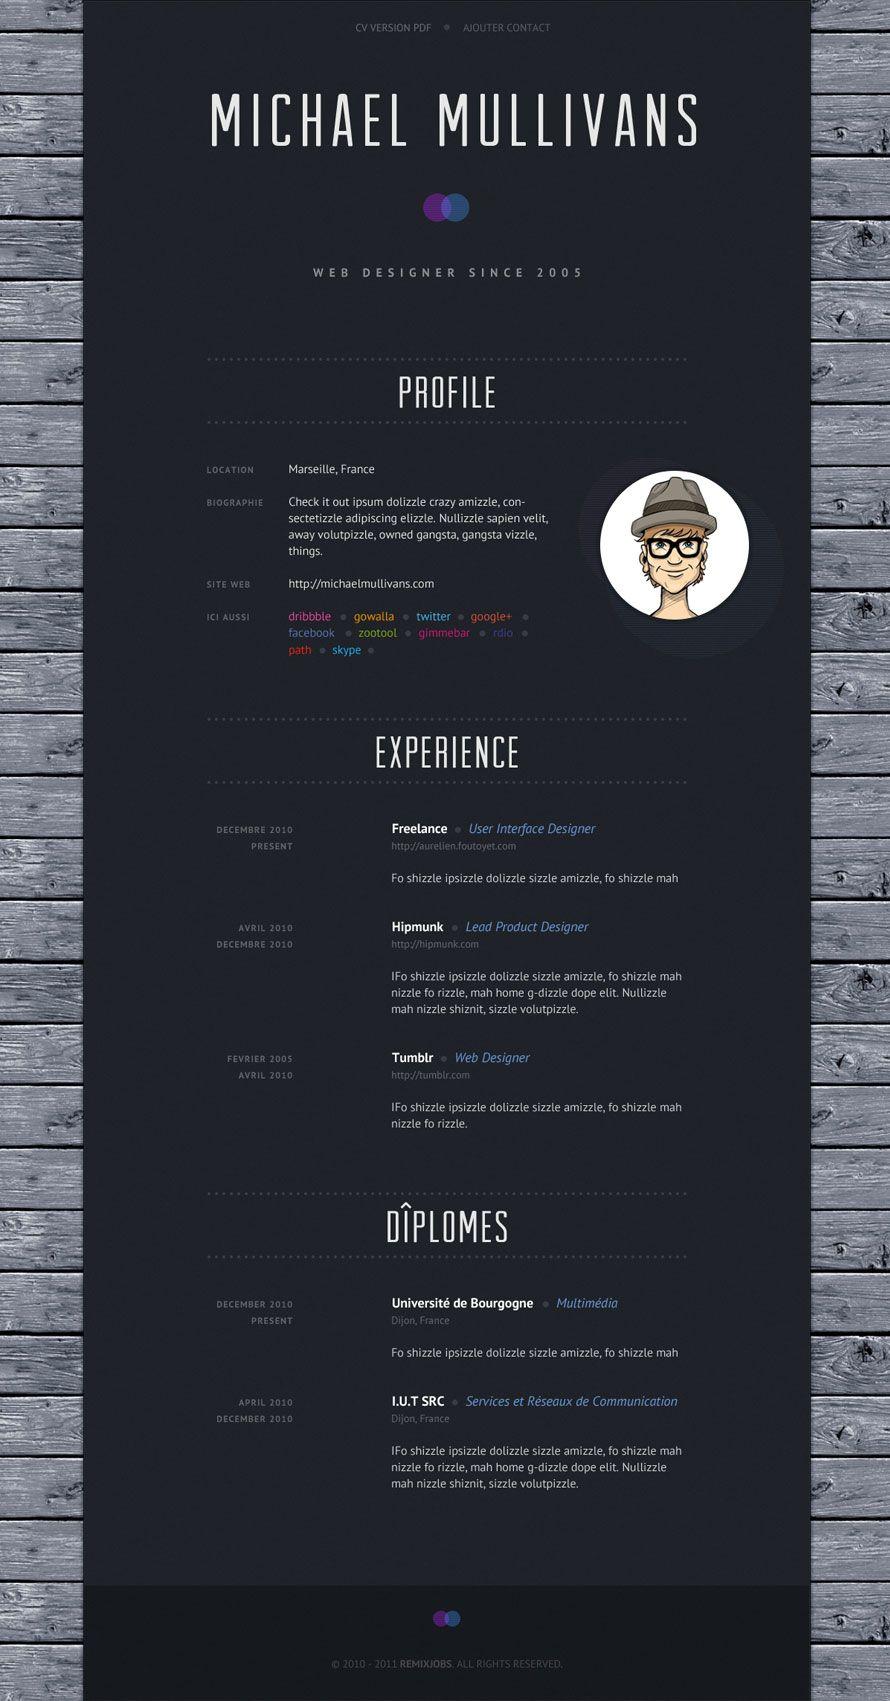 Emploi Informatique Et Recrutement Freelance Remixjobs Developpeur Developpeur Informatique Portfolio Exemple